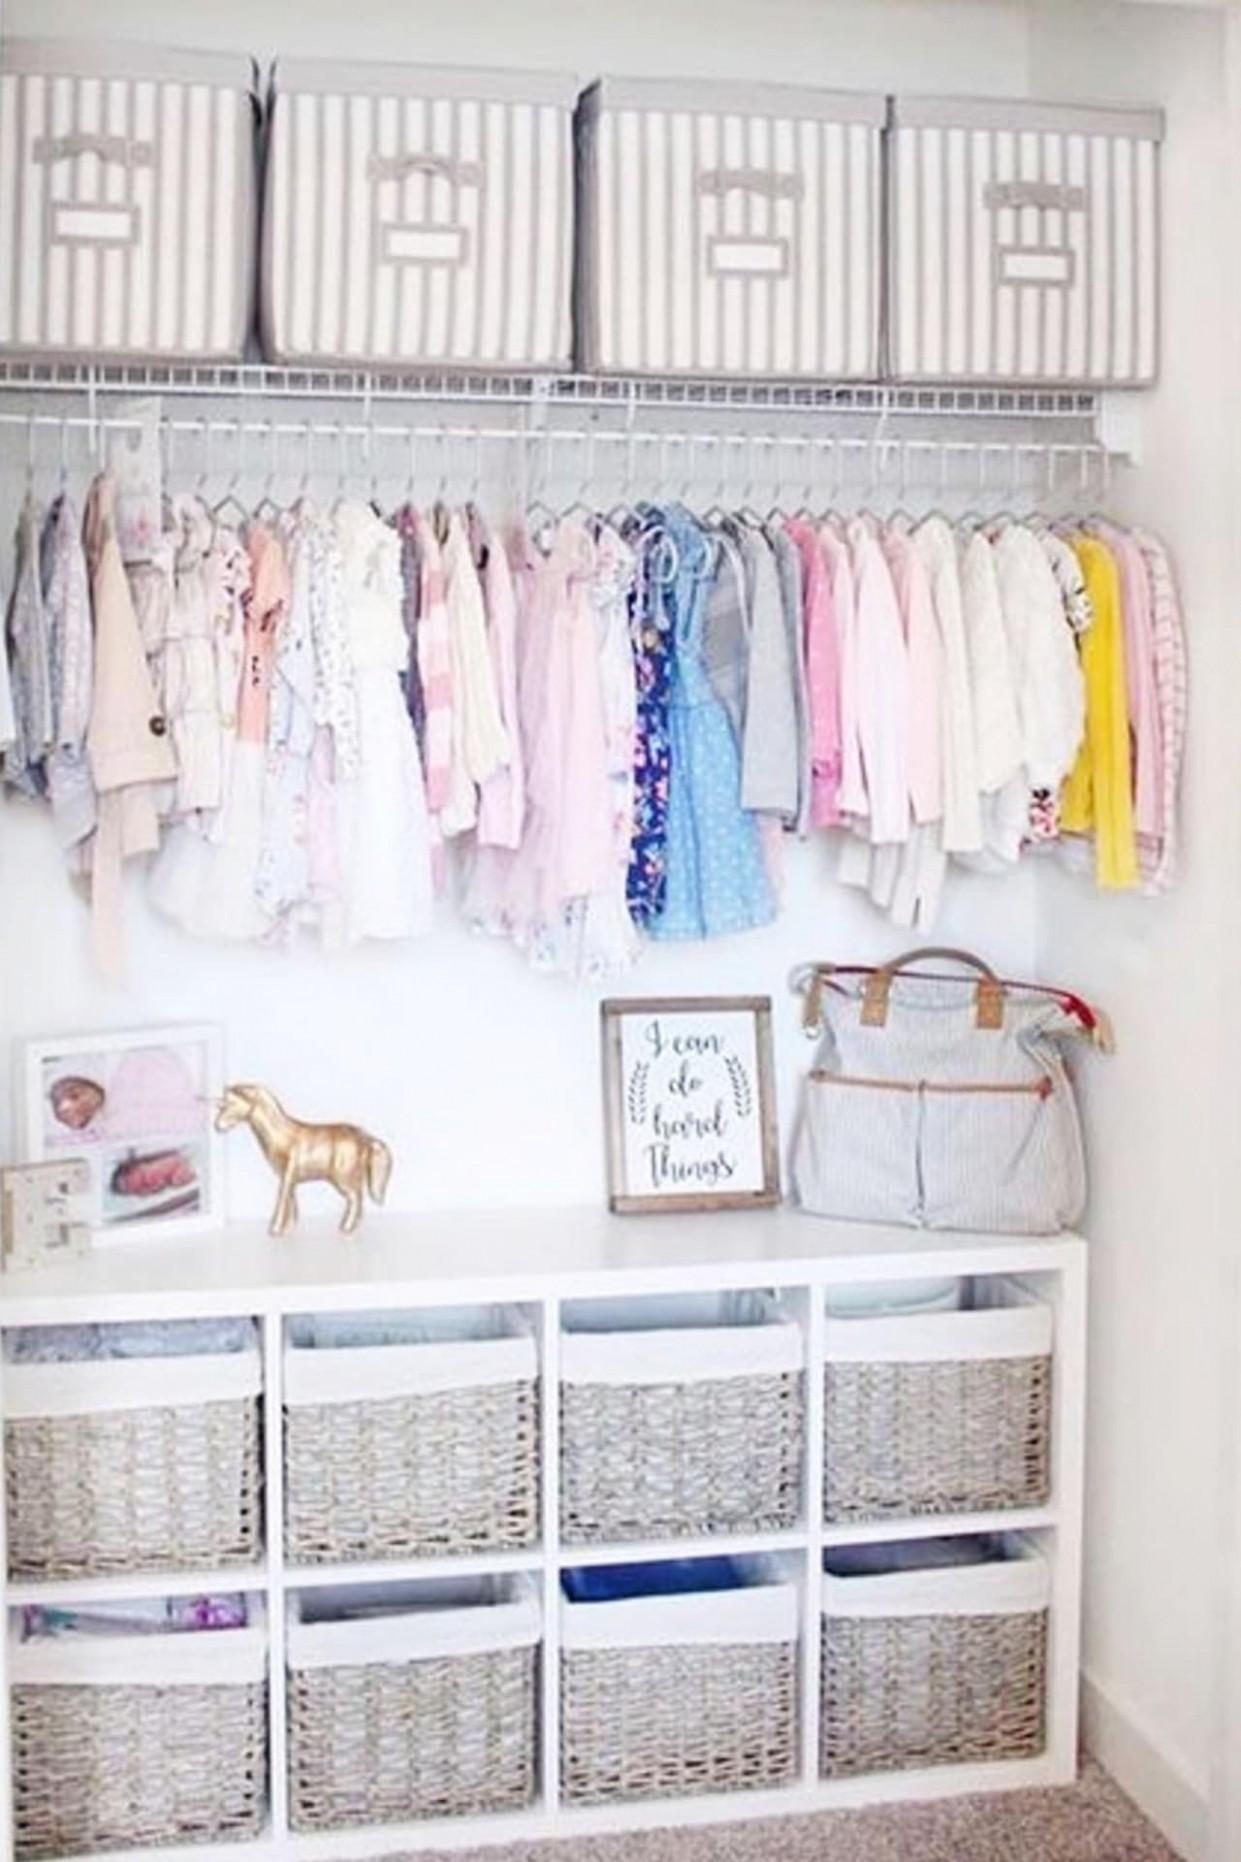 Baby Closet Ideas: 12 Nursery Closet Organization, Storage and  - Baby Room Organization